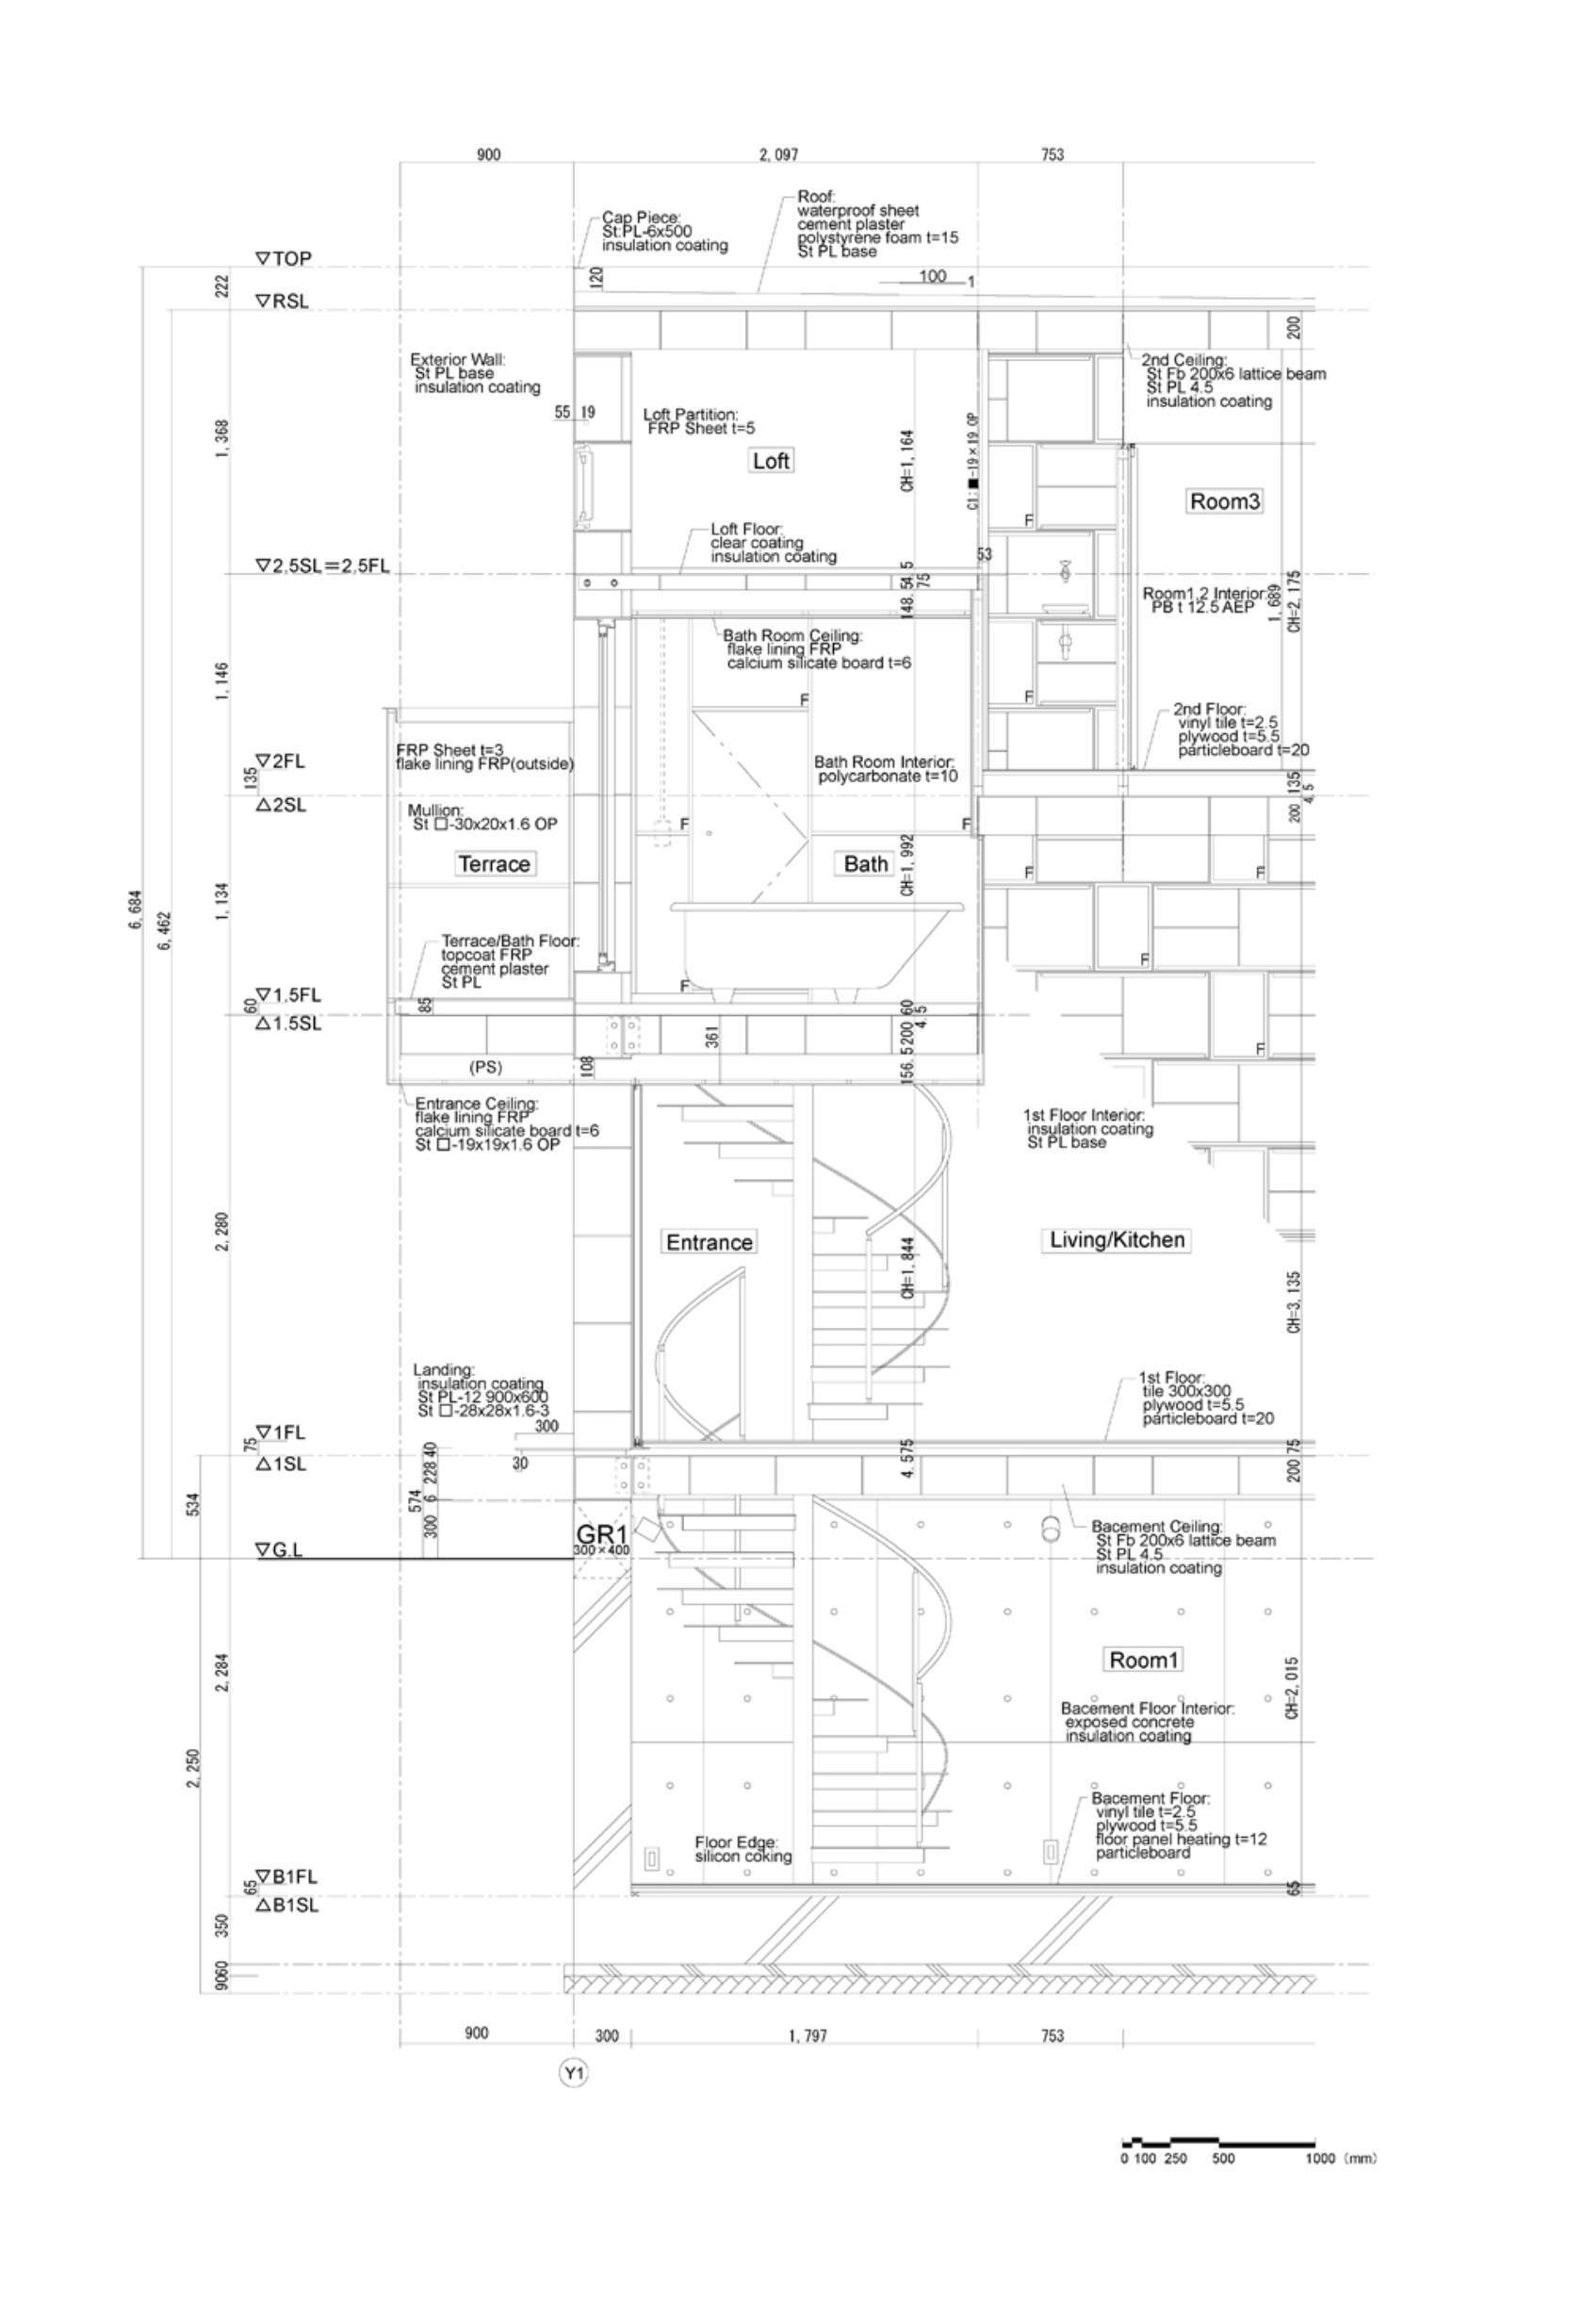 1680x2466 Cell Brick Yasuhiro Yamashita Tokyo